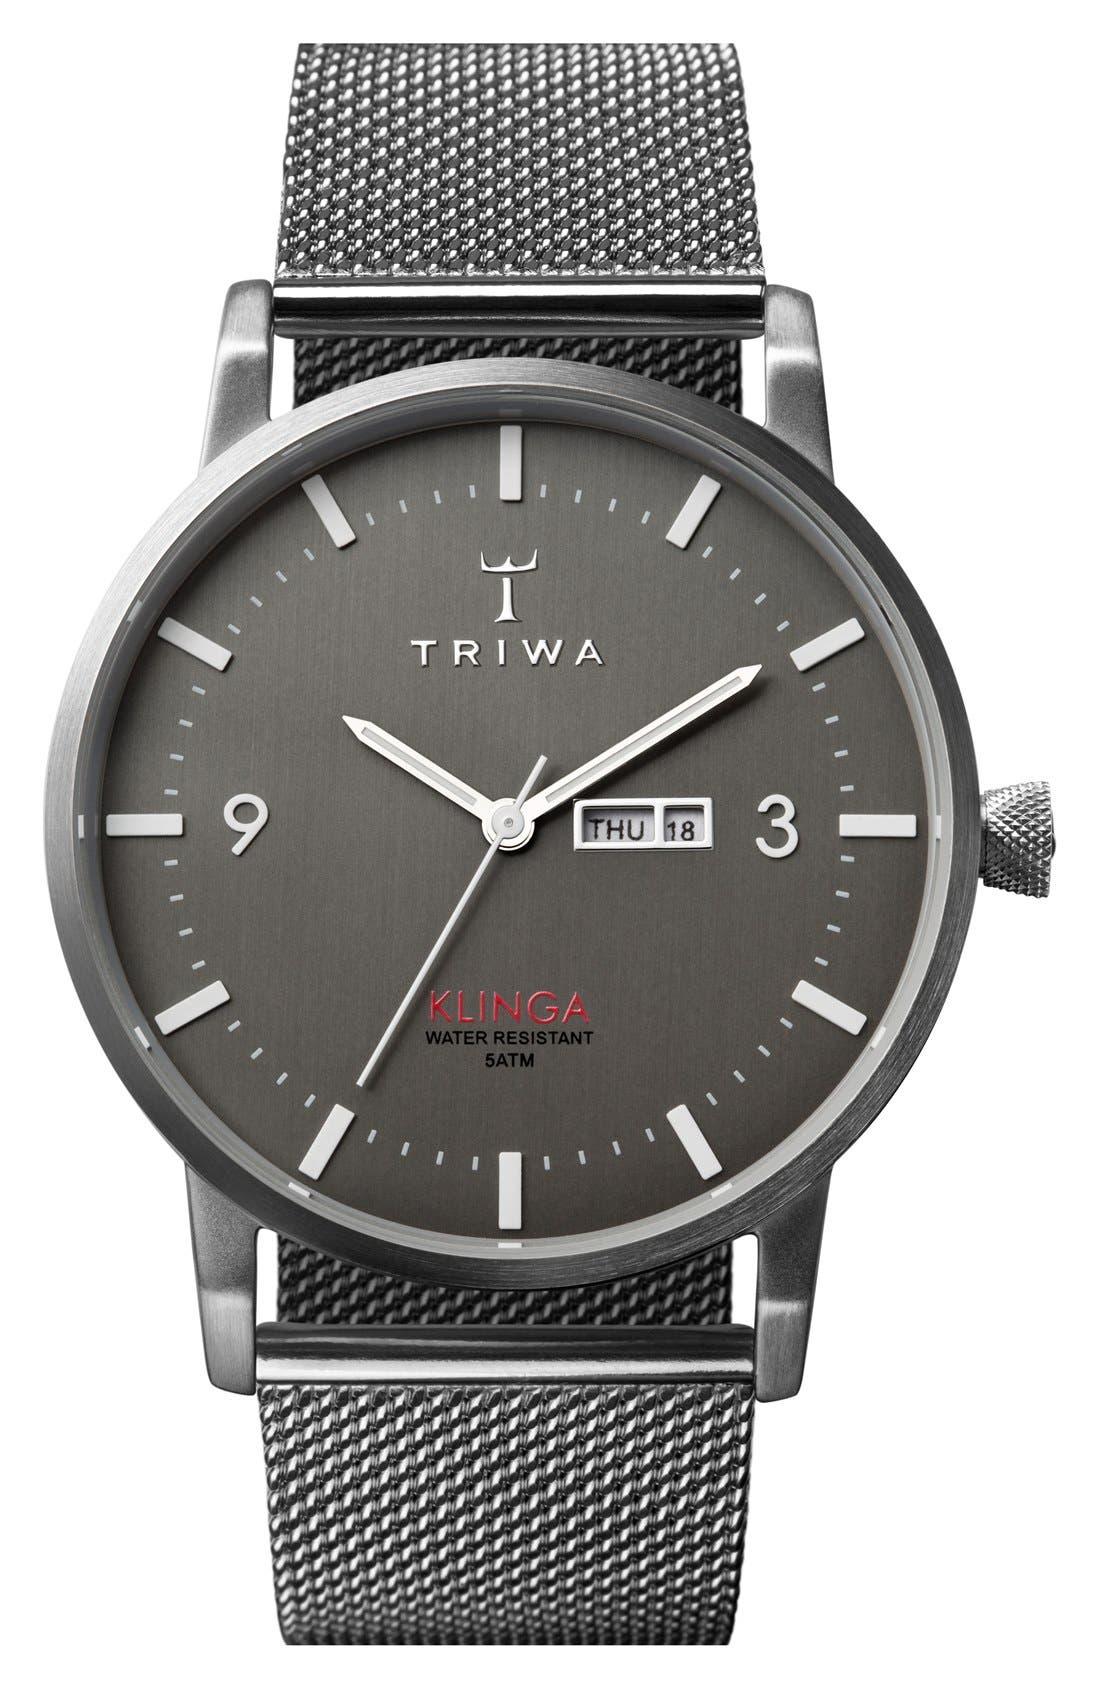 Main Image - TRIWA Klinga Mesh Strap Watch, 38mm